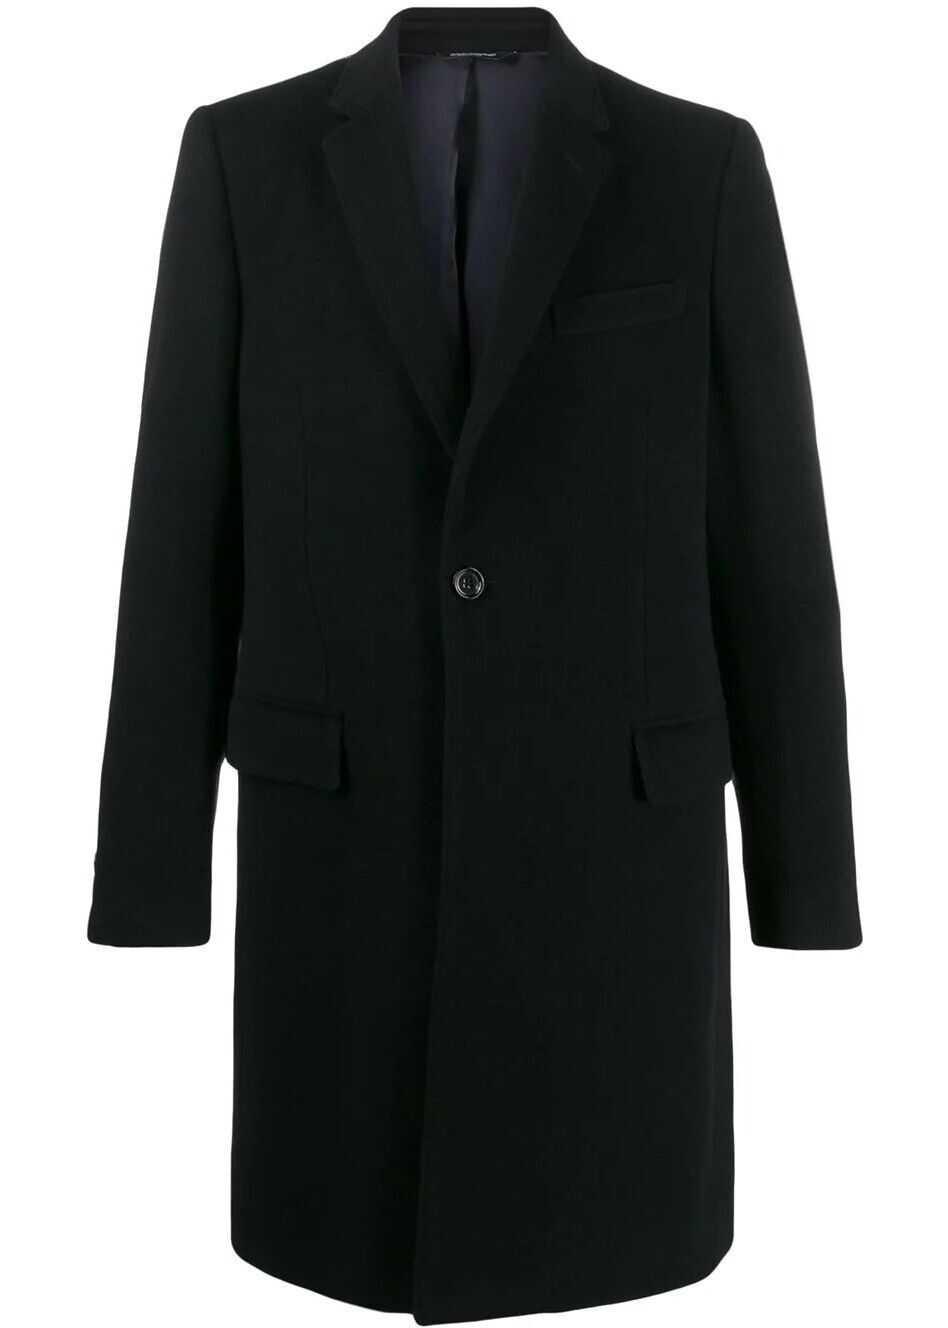 Dolce & Gabbana Wool Coat BLACK